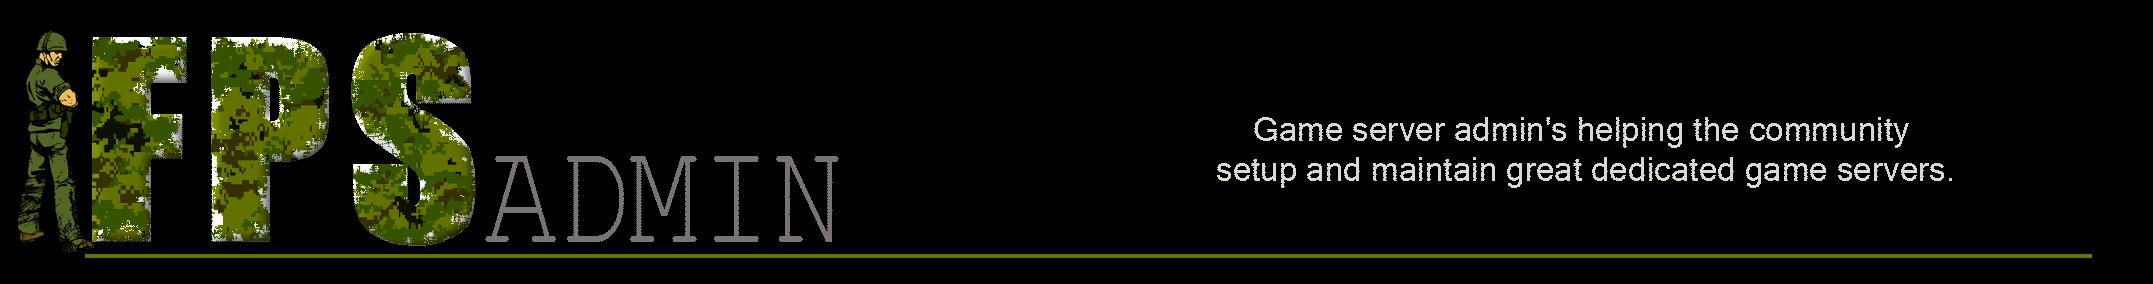 https://www.fpsadmin.com/logo1.png